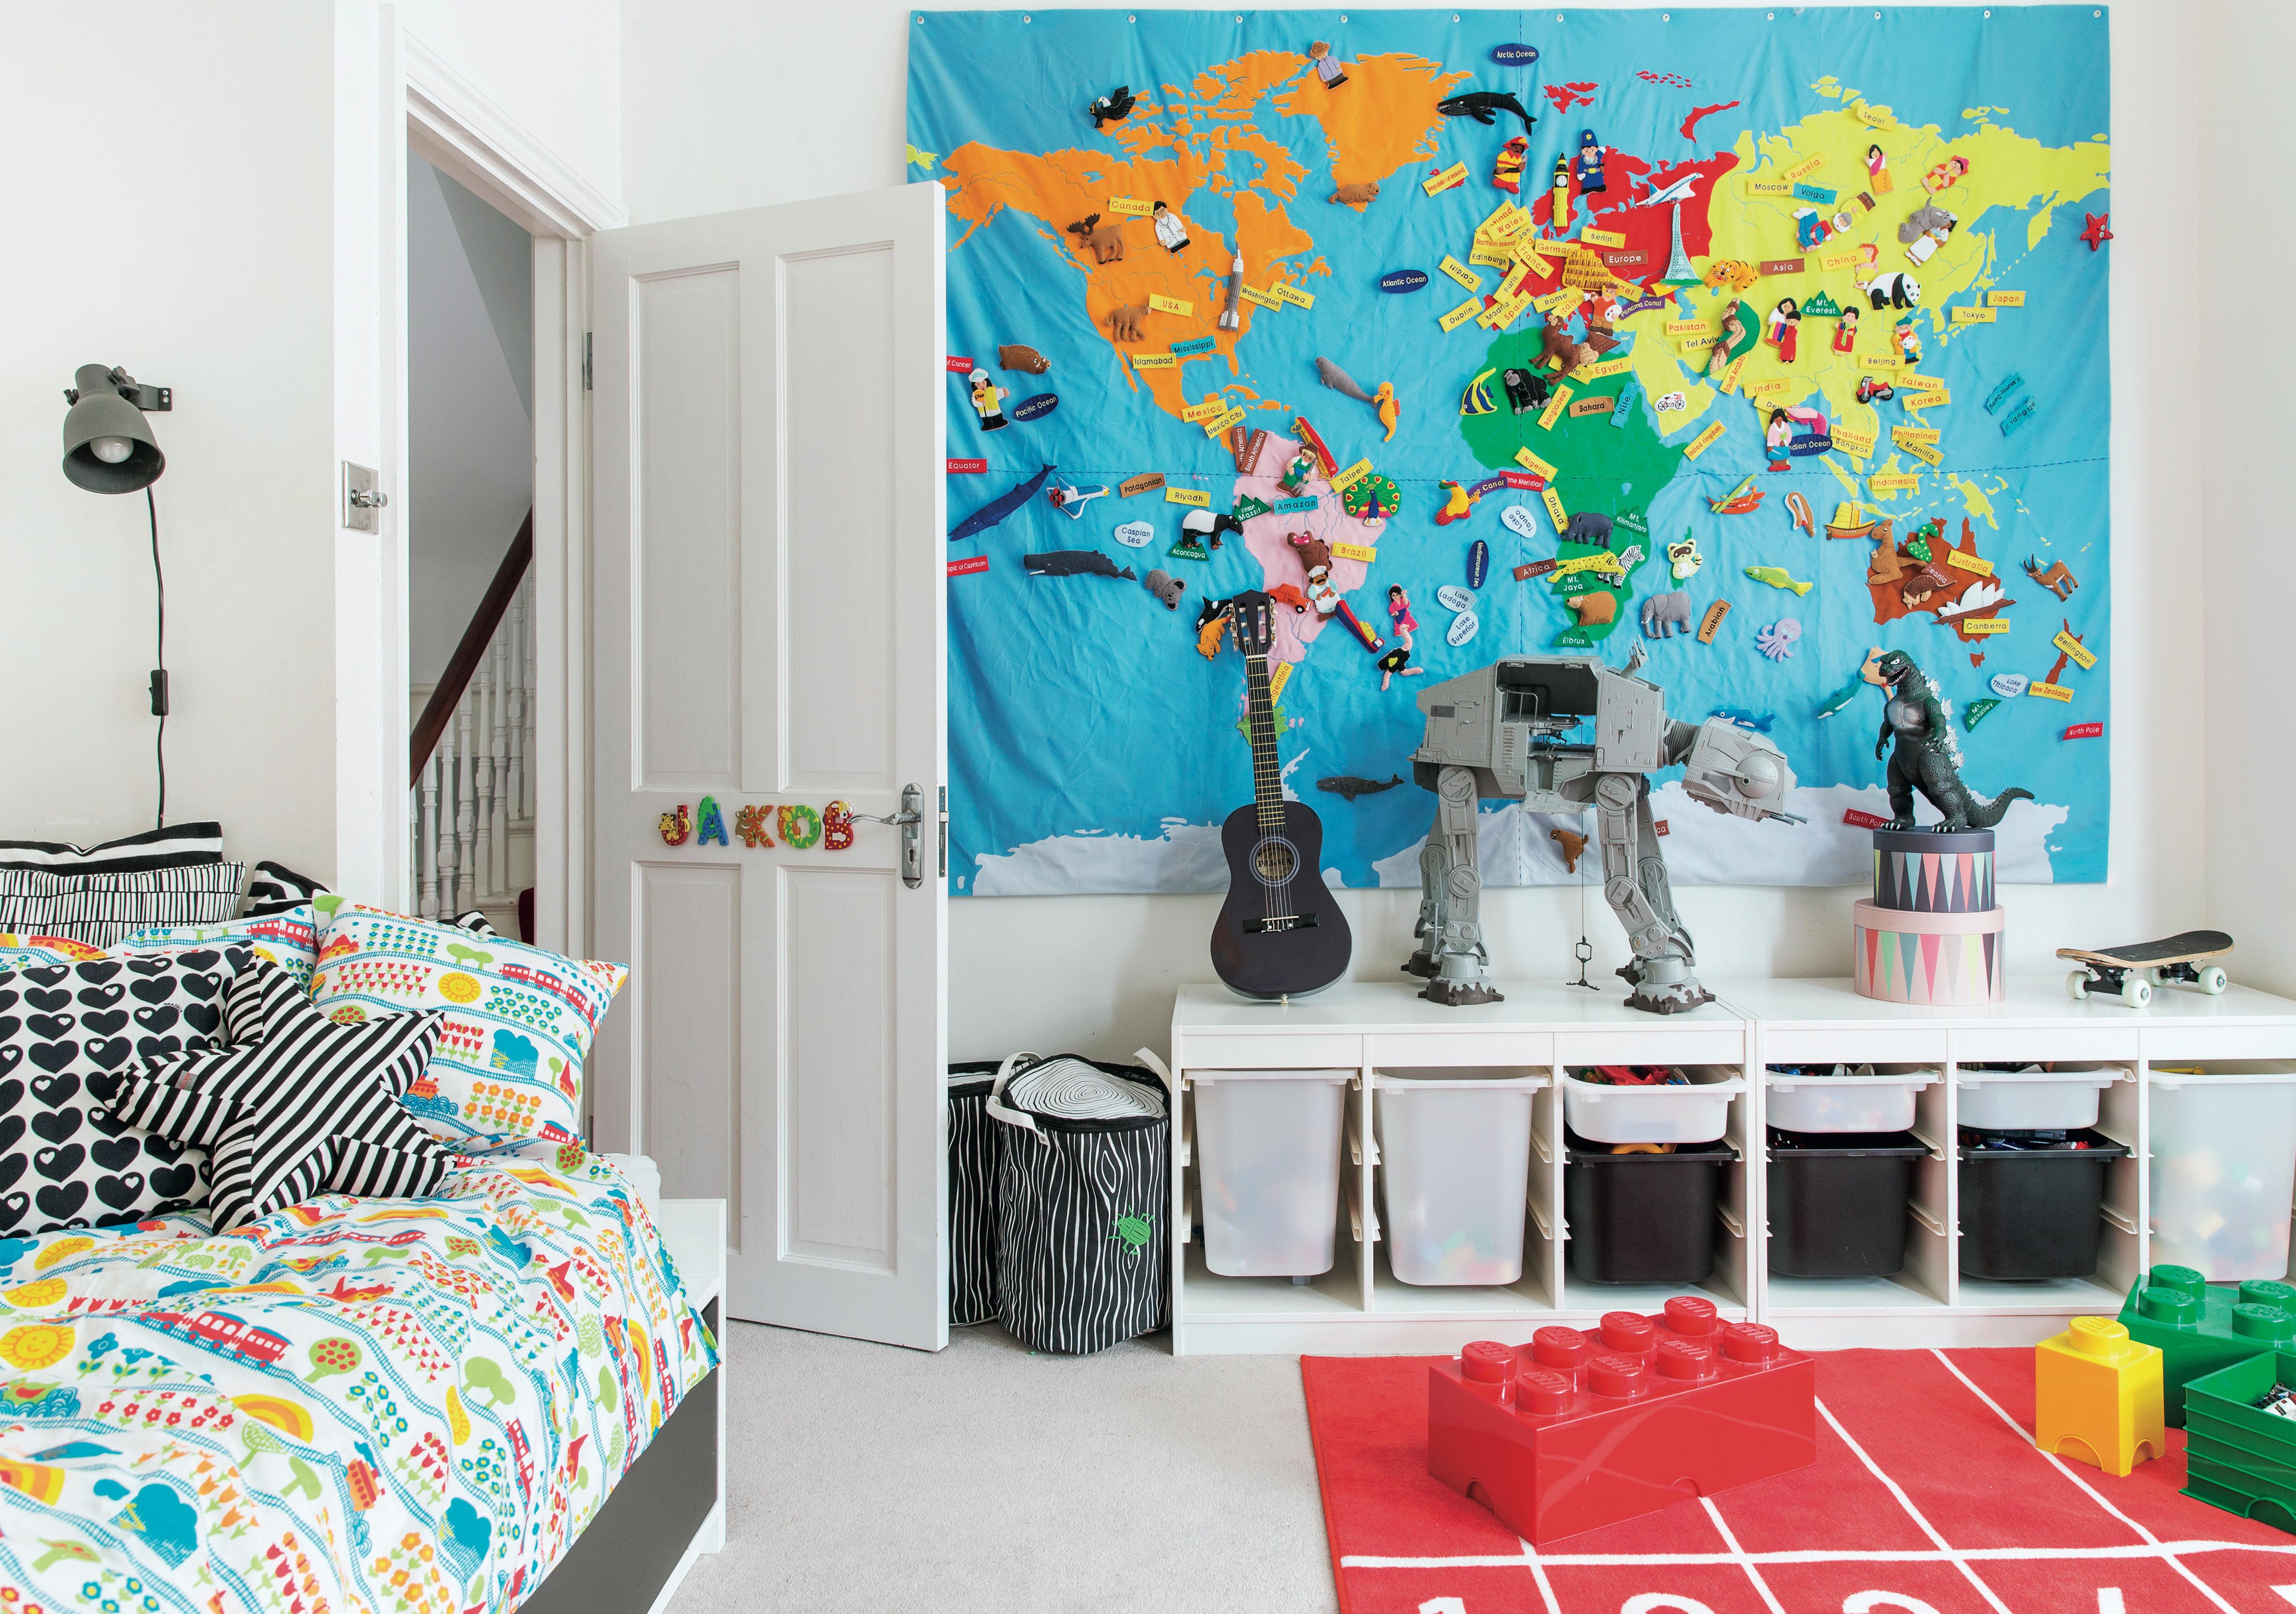 raum f r tr ume fantasievoll wohnen mit kindern knesebeck verlag. Black Bedroom Furniture Sets. Home Design Ideas